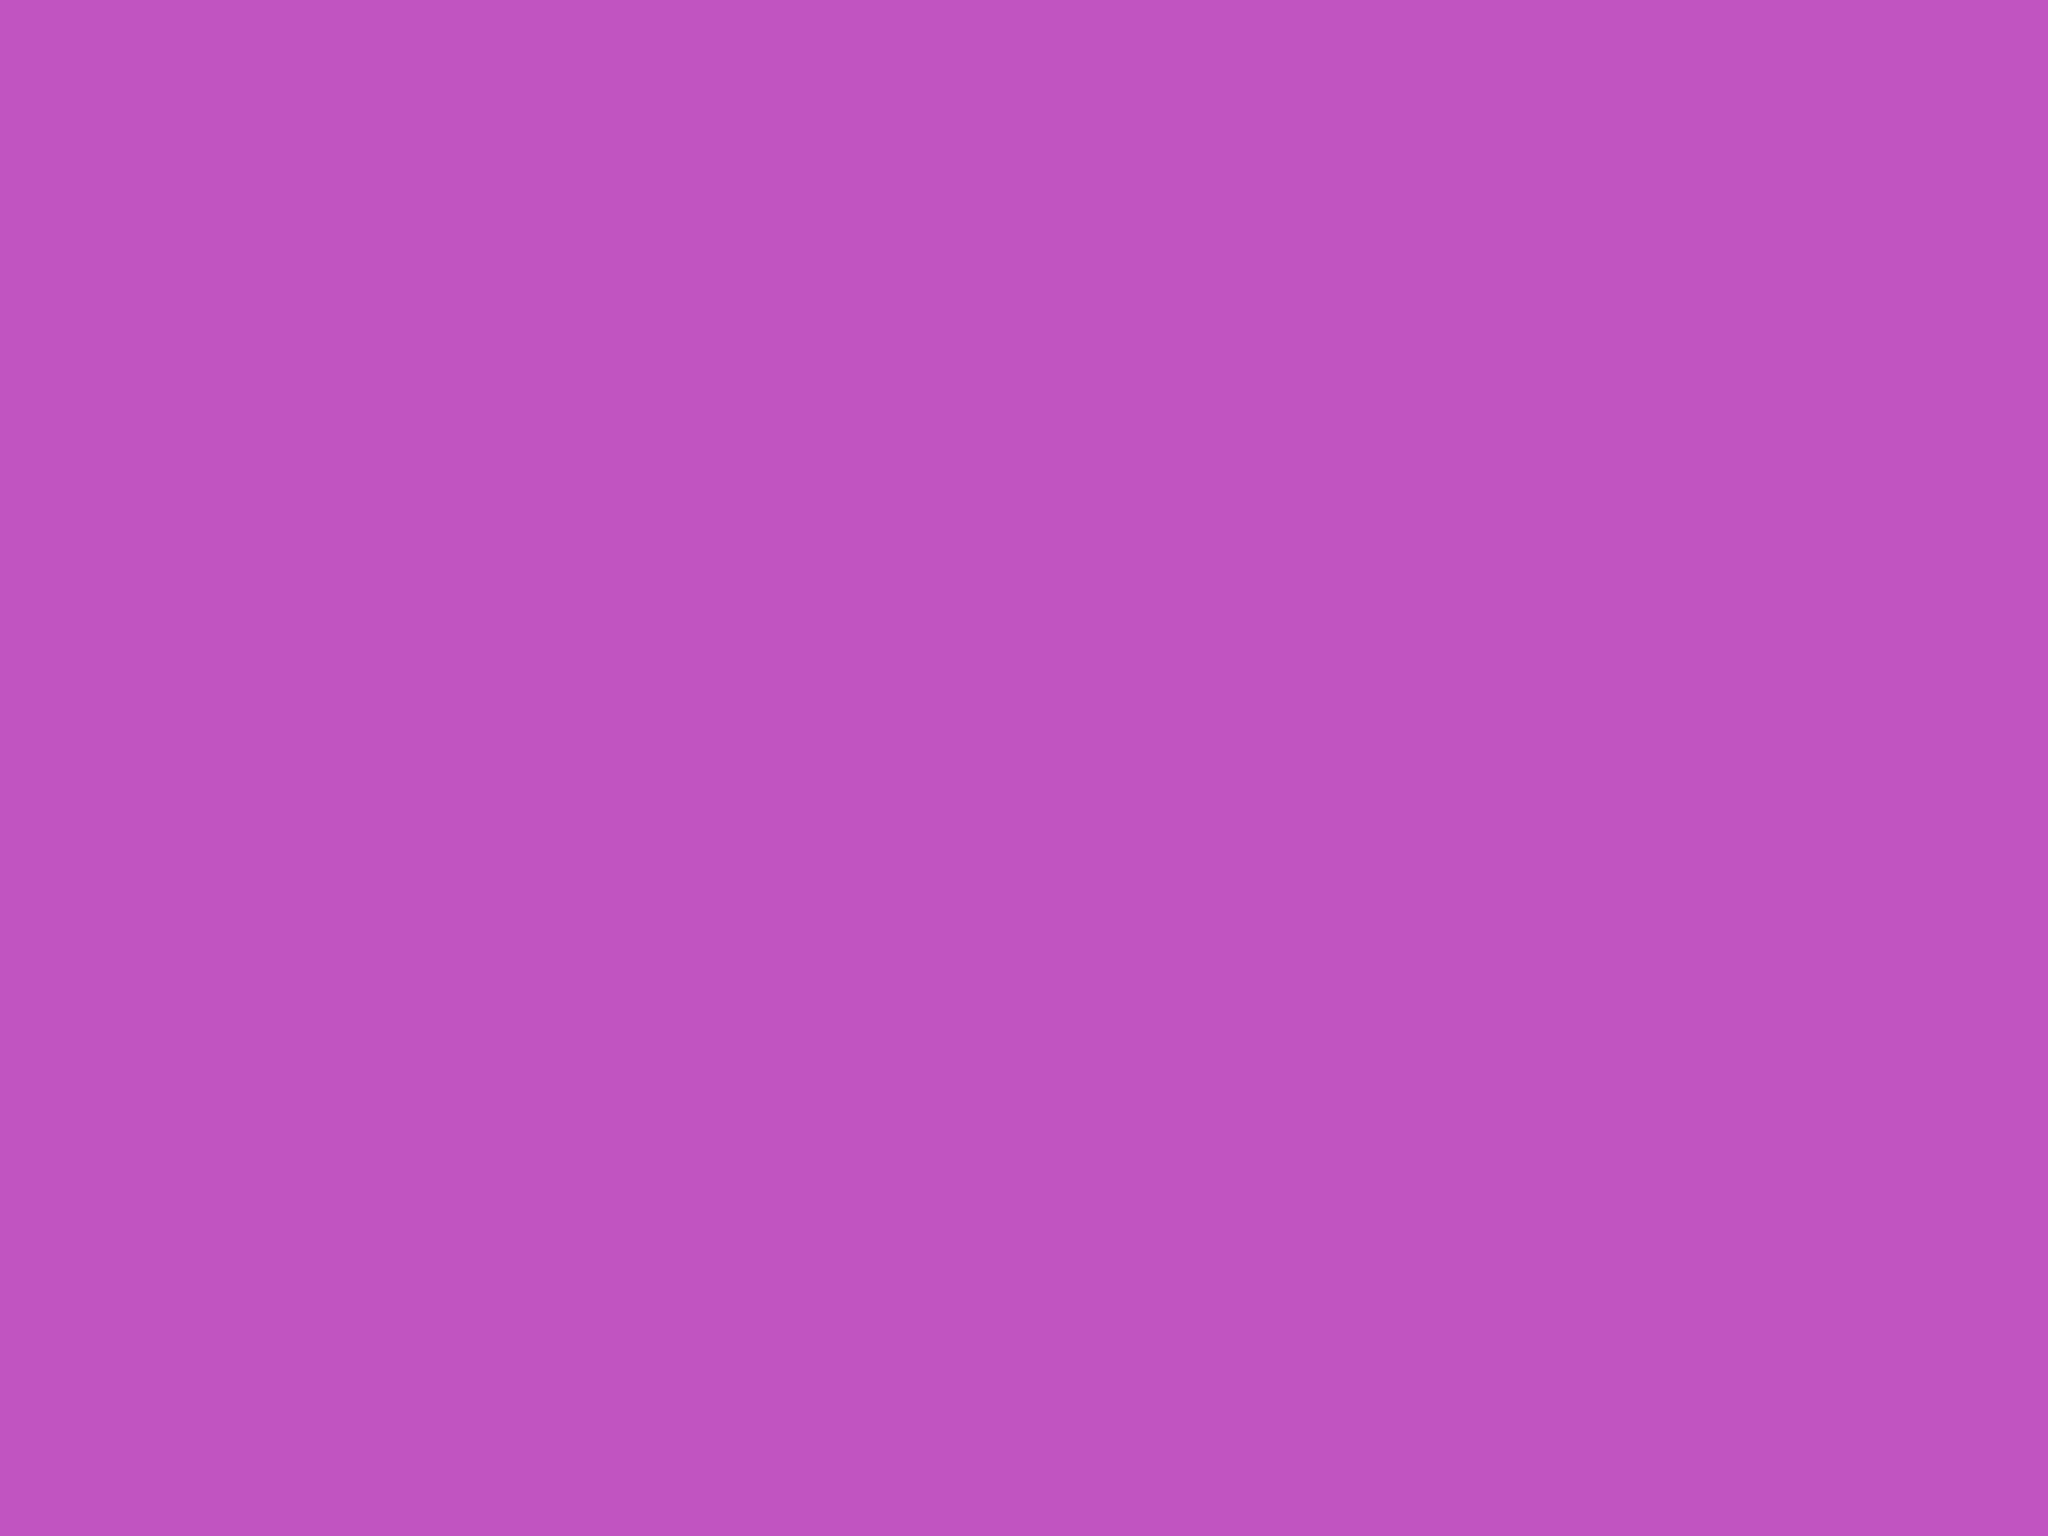 2048x1536 Fuchsia Crayola Solid Color Background